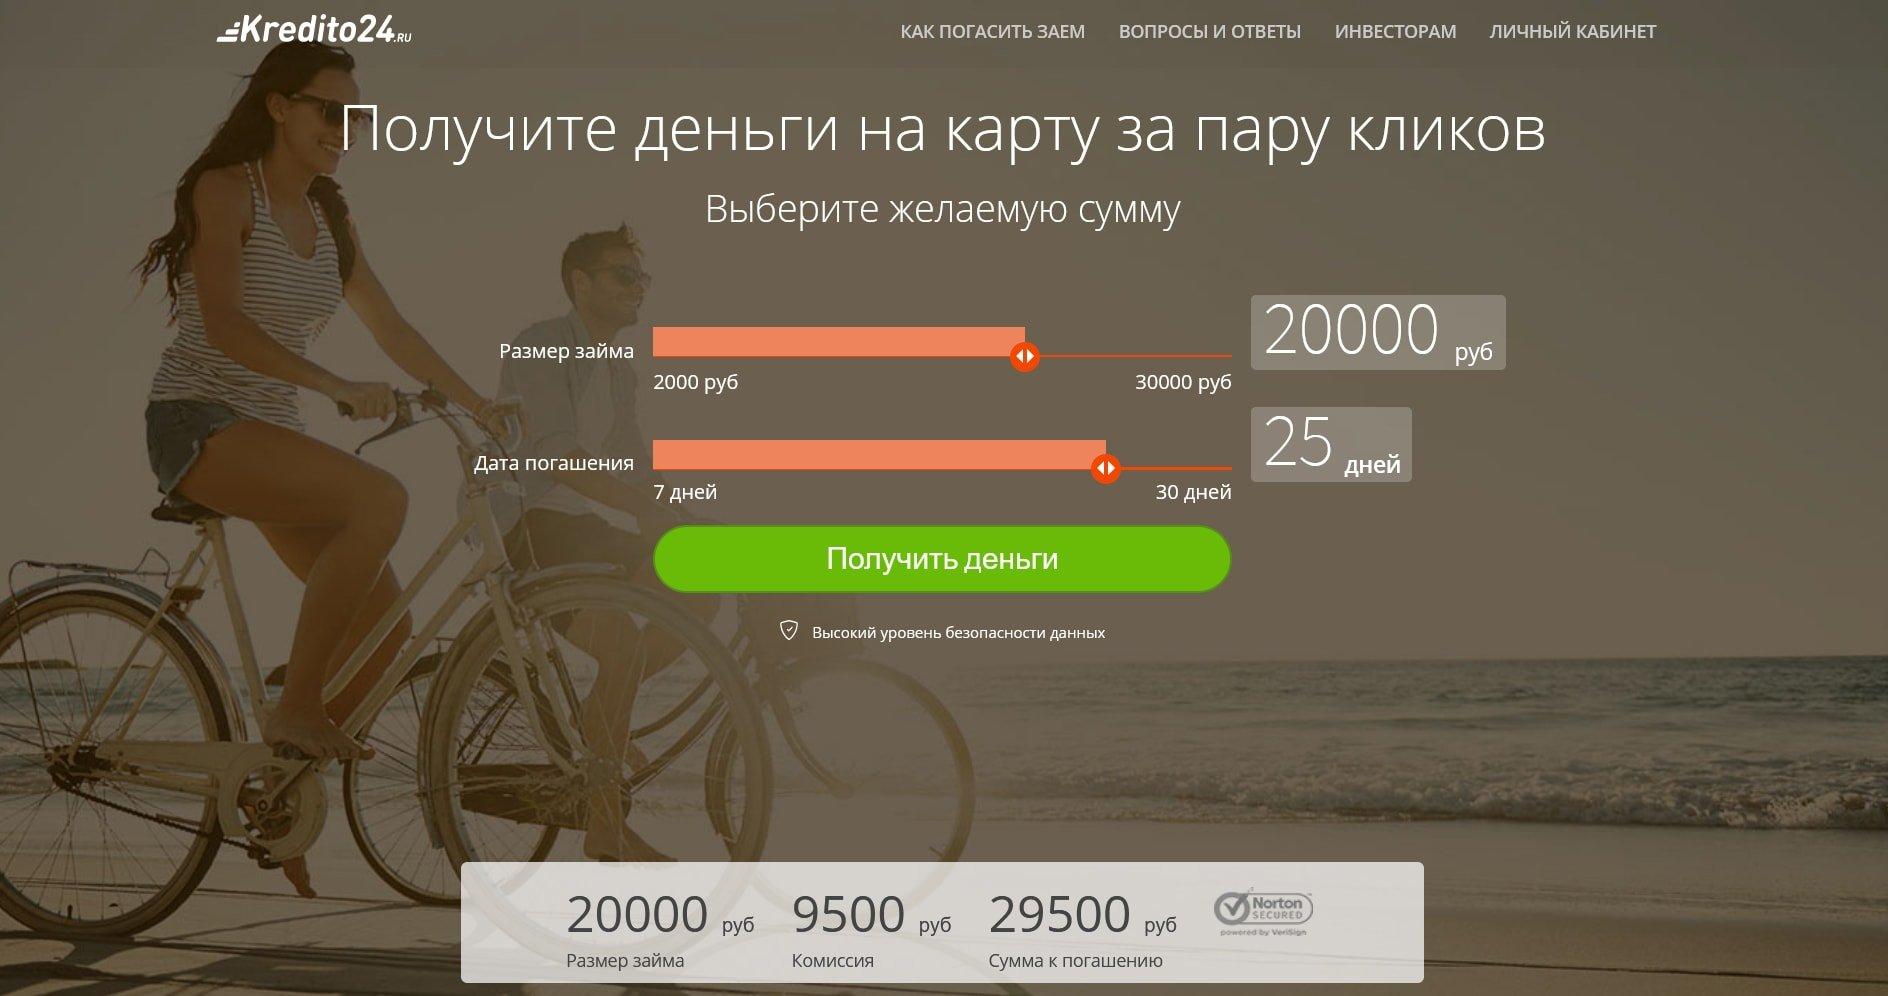 мфо кредито 24 россия